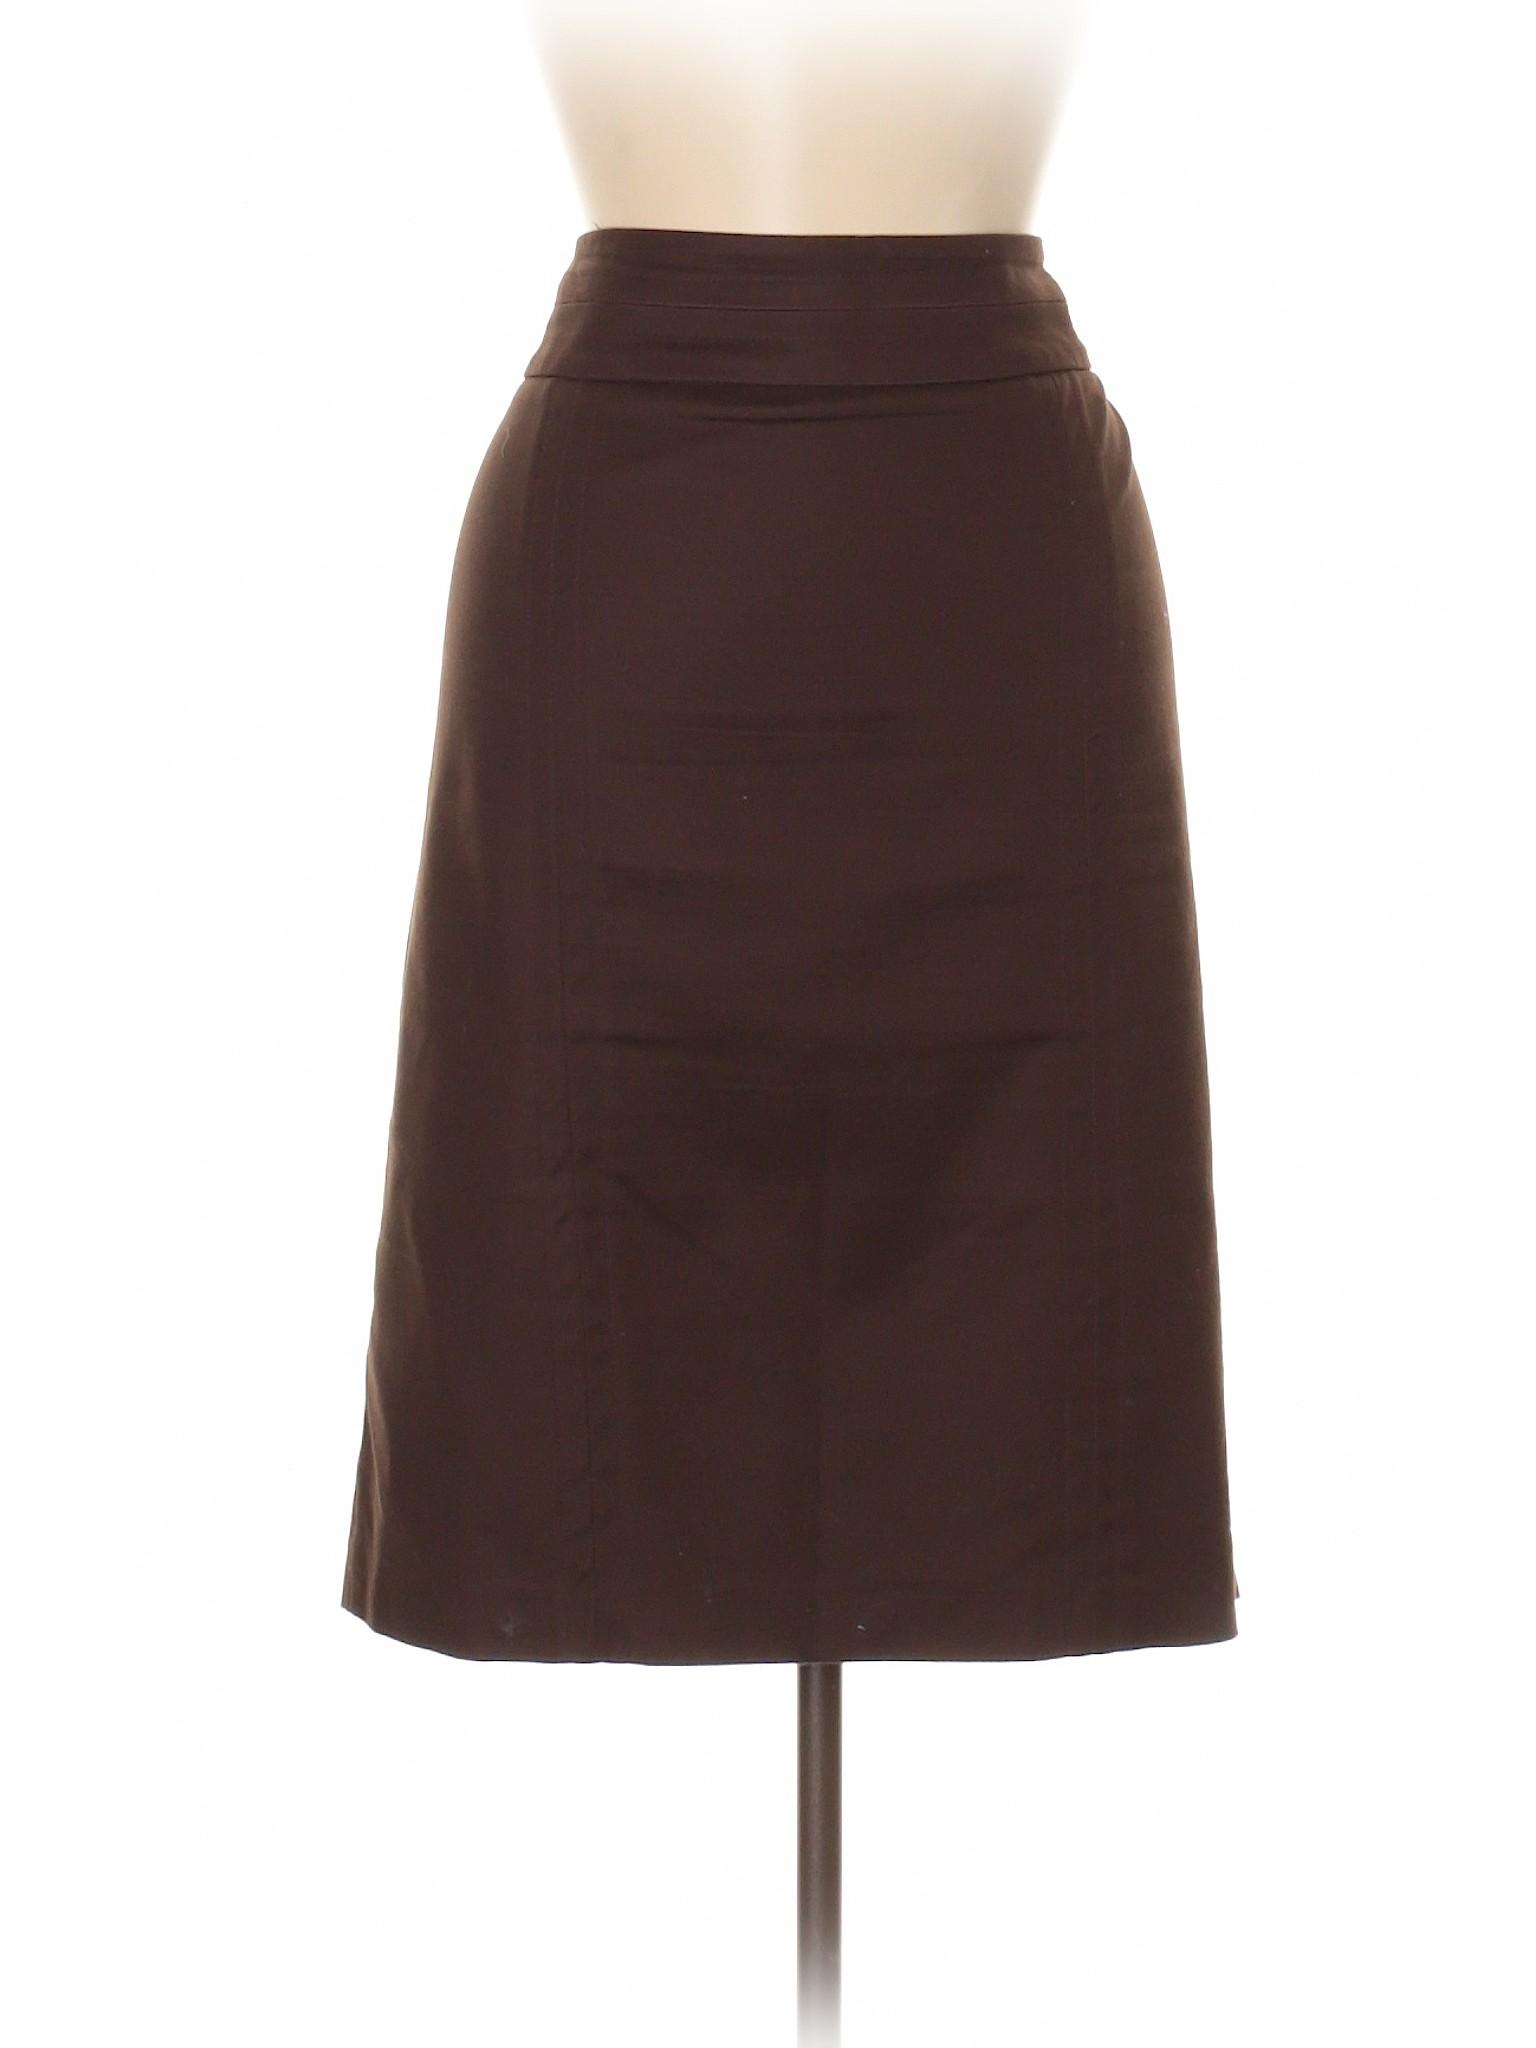 Skirt Boutique Casual Boutique Kenar Kenar wqaIZ7